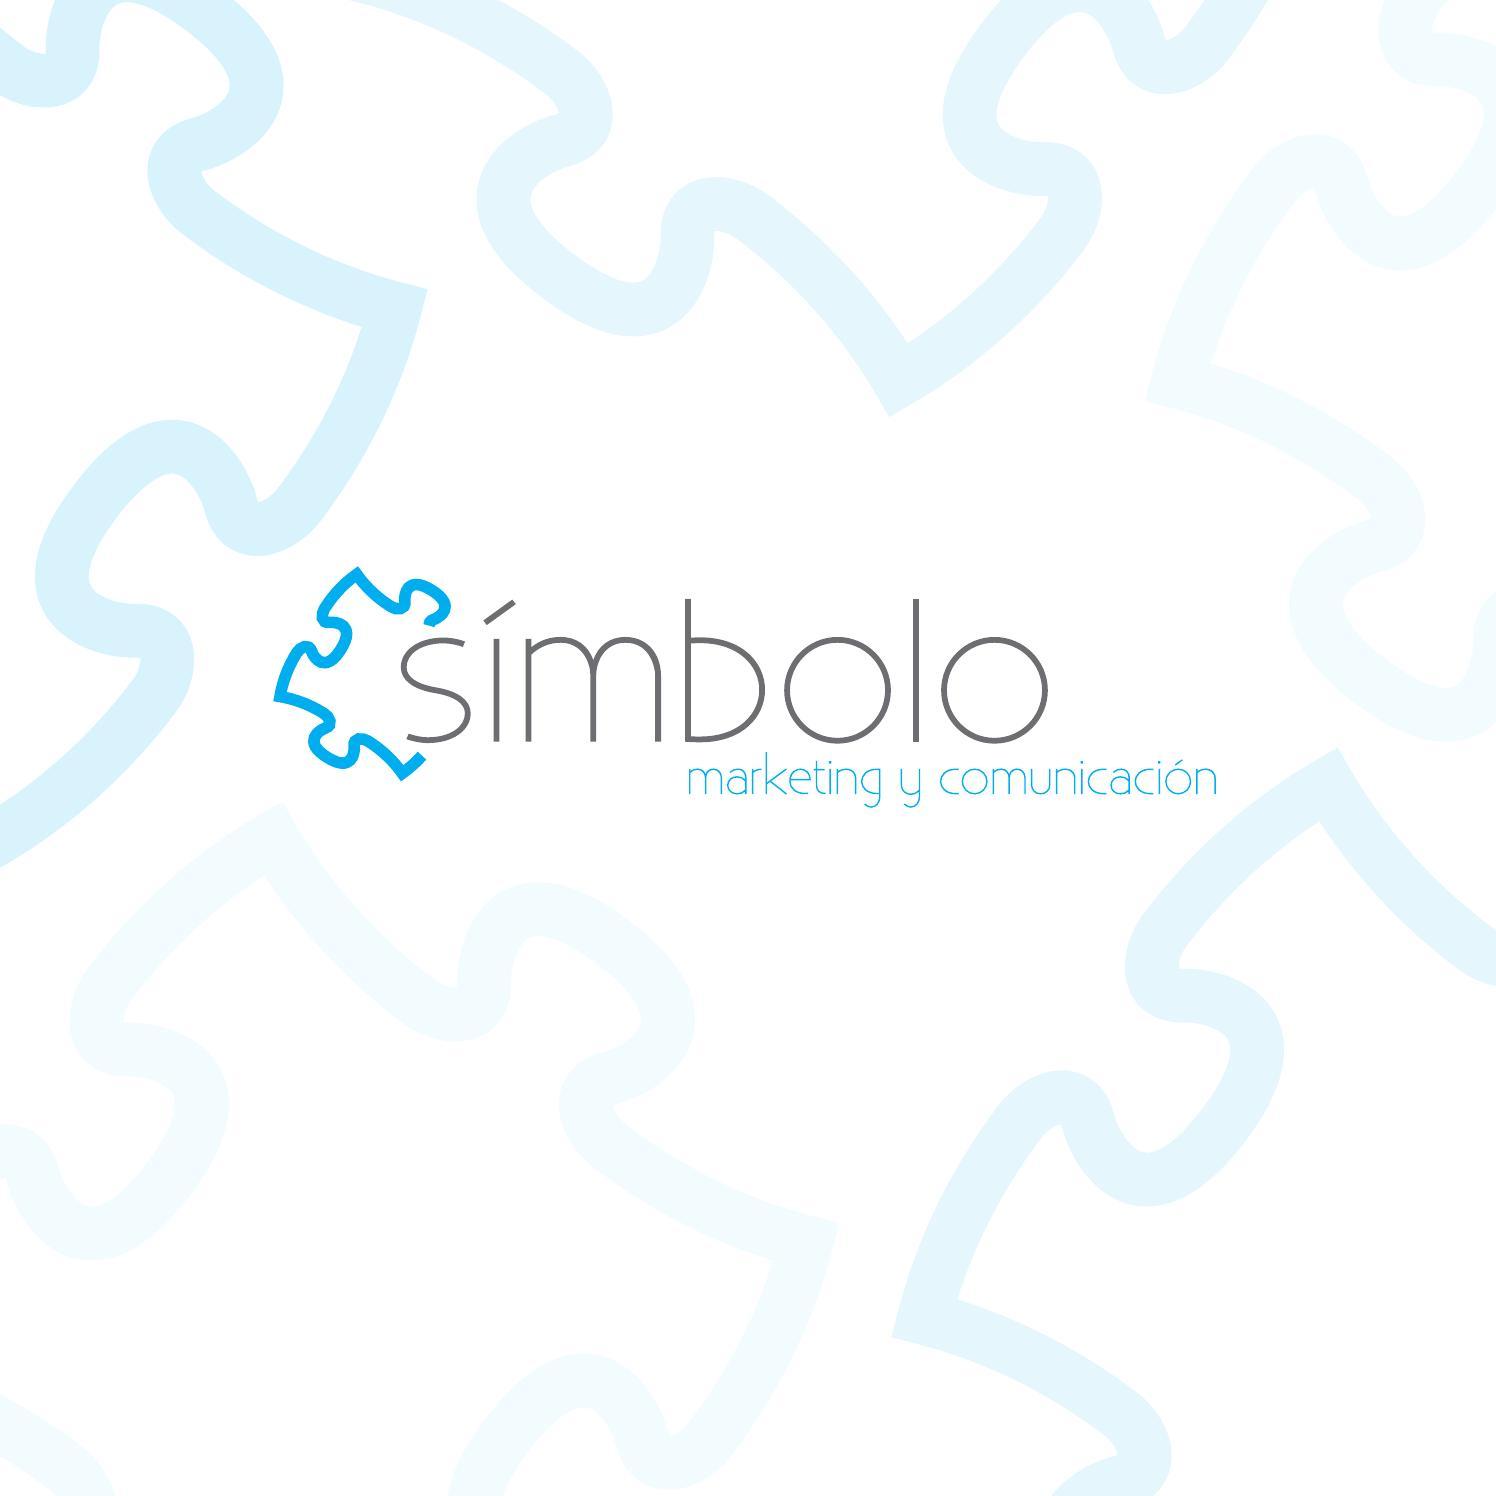 7a406bebfbea Catalogo 2013 clientes1 by Simbolo Grafico - issuu